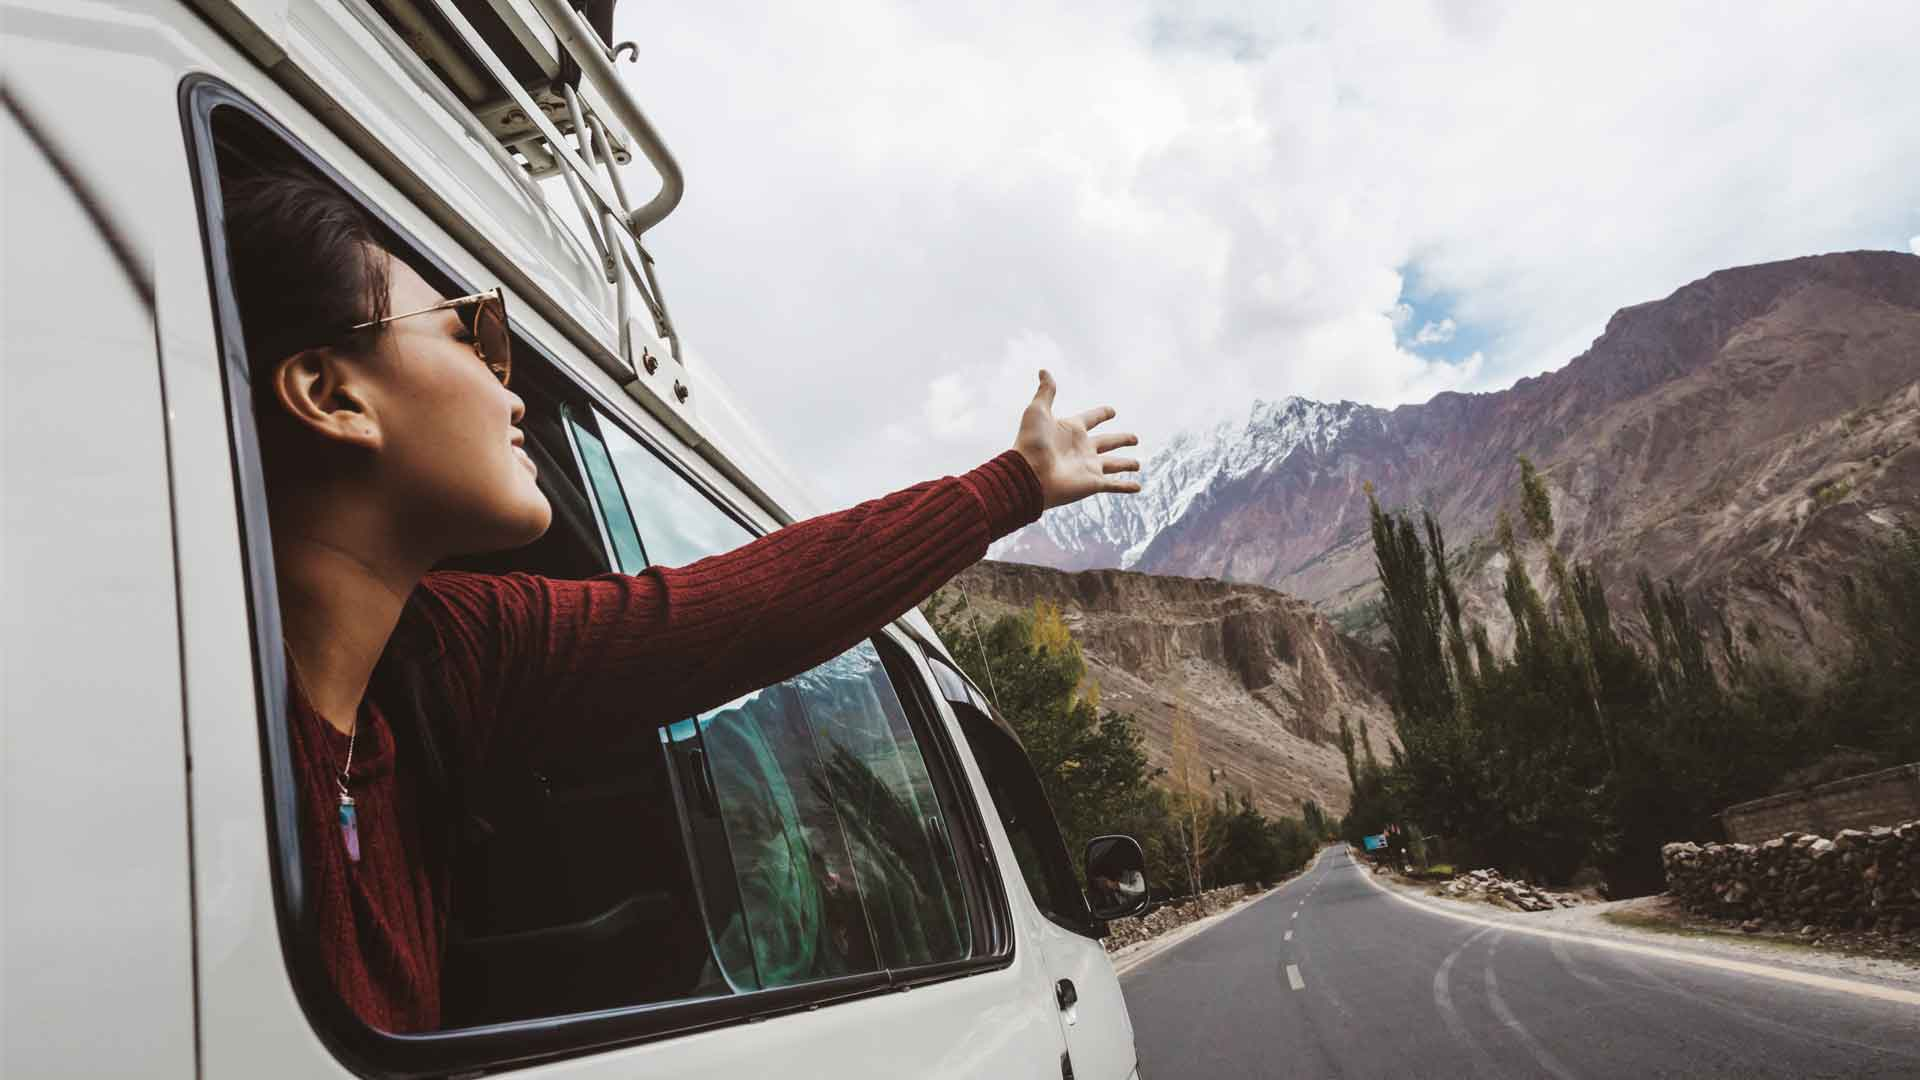 Destinos nacionales para viajar por carretera